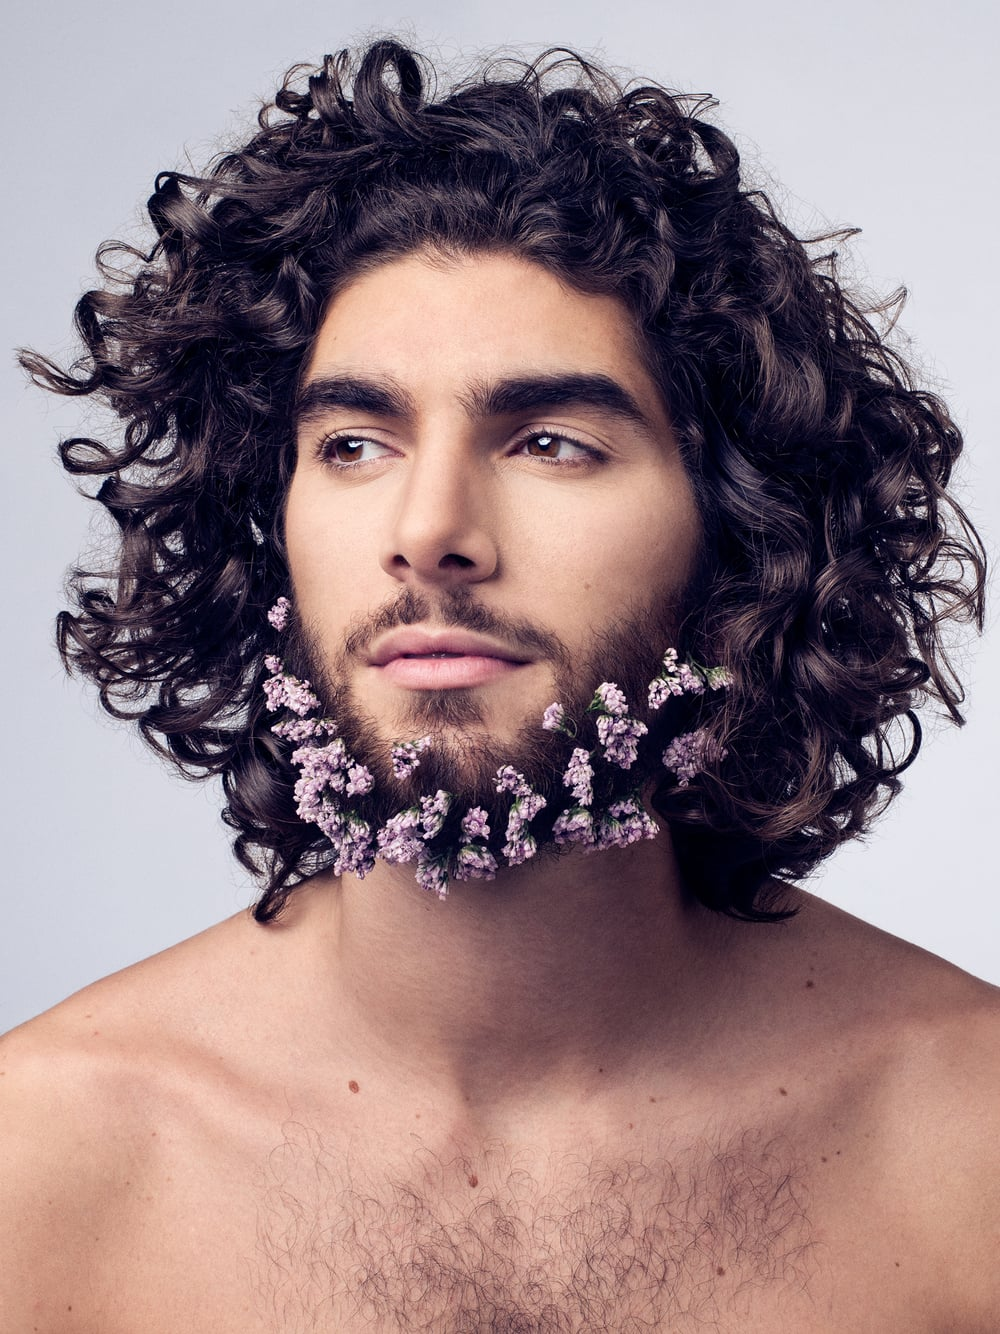 Modell:Christos Mitsakis